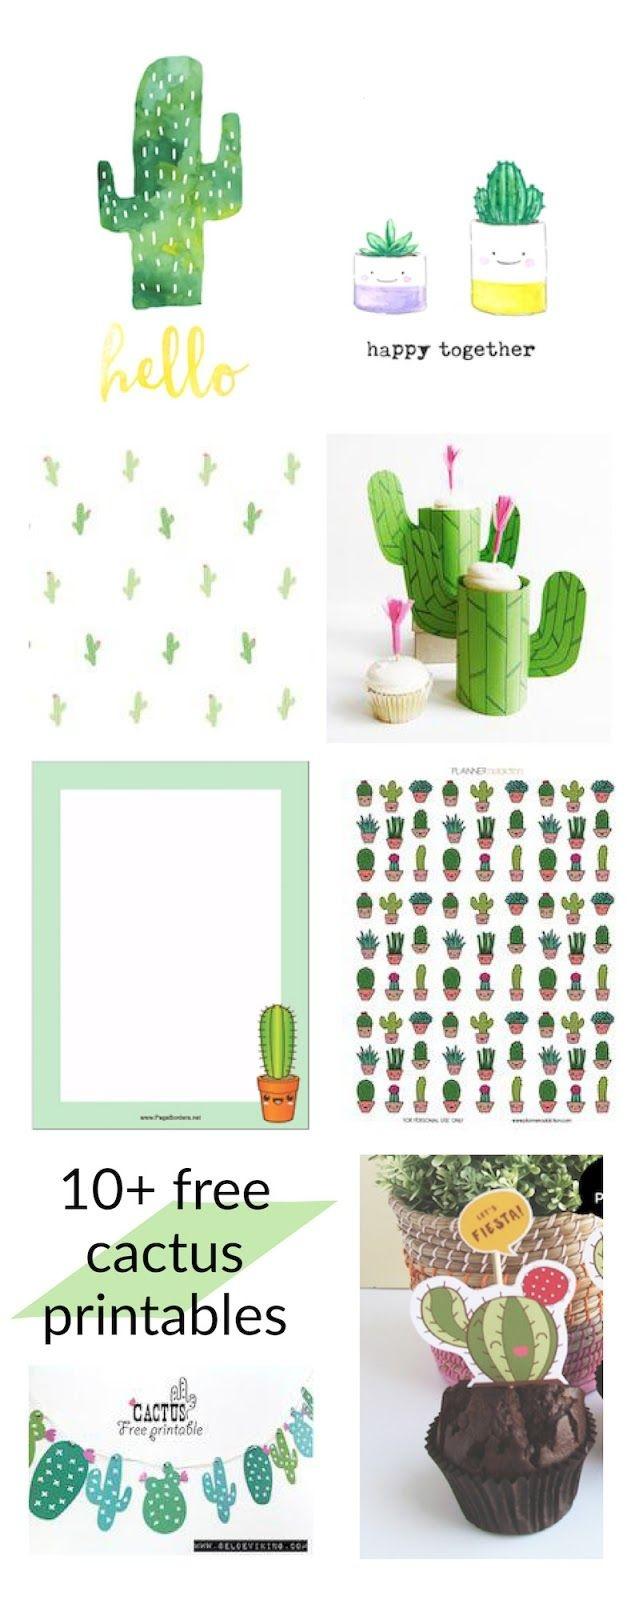 Free Cactus Printables - Kaktus - Round-Up | Printables | Classroom - Free Printable Cactus